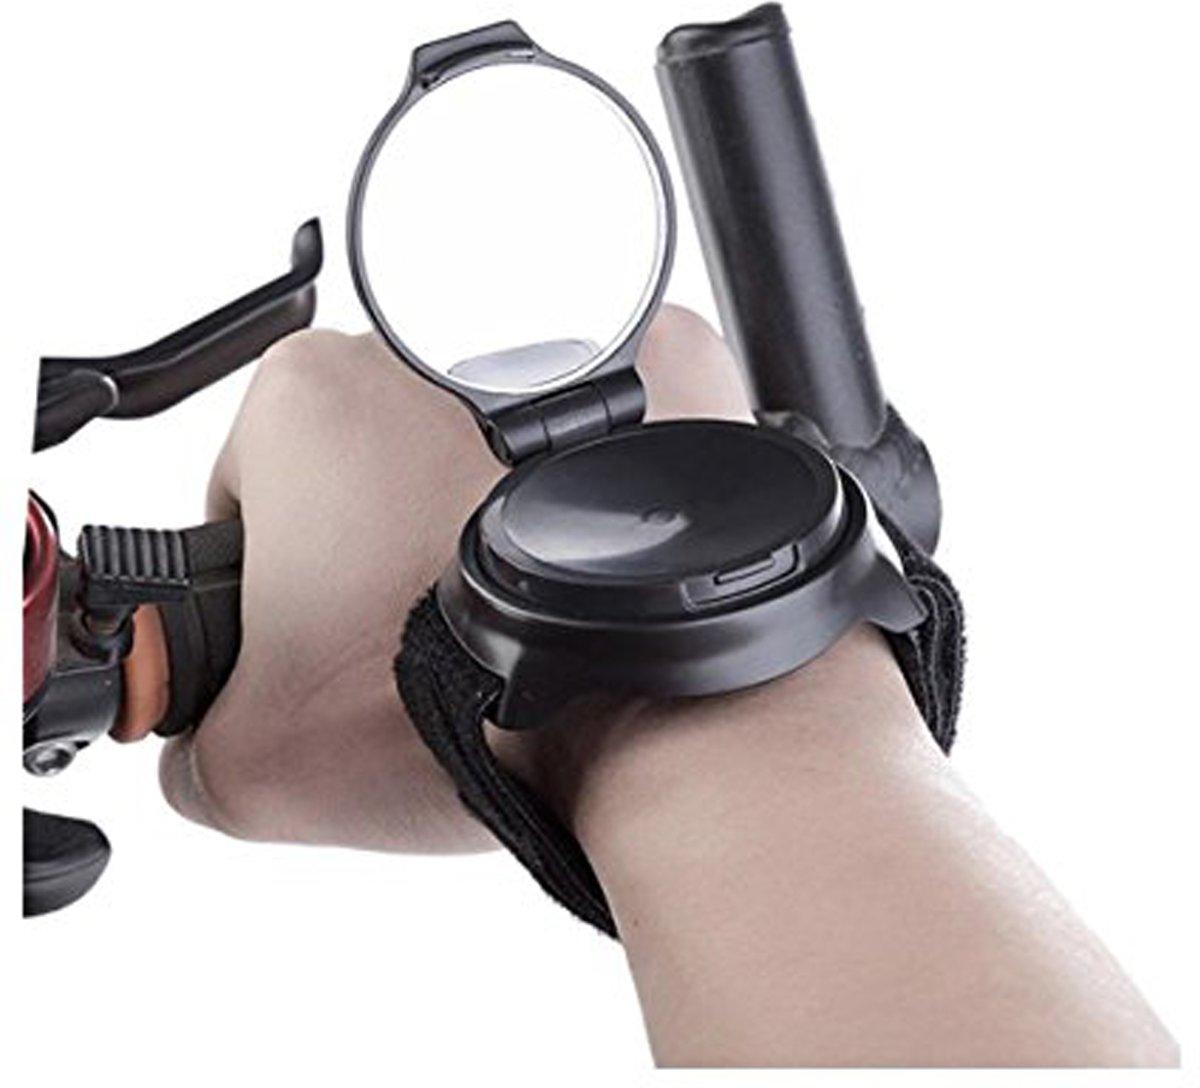 Fietsspiegel armband 360º roterend- achteruitkijkspiegel fiets - mountainbike accessoires - fietsspiegelpolsband – fiets armspiegel